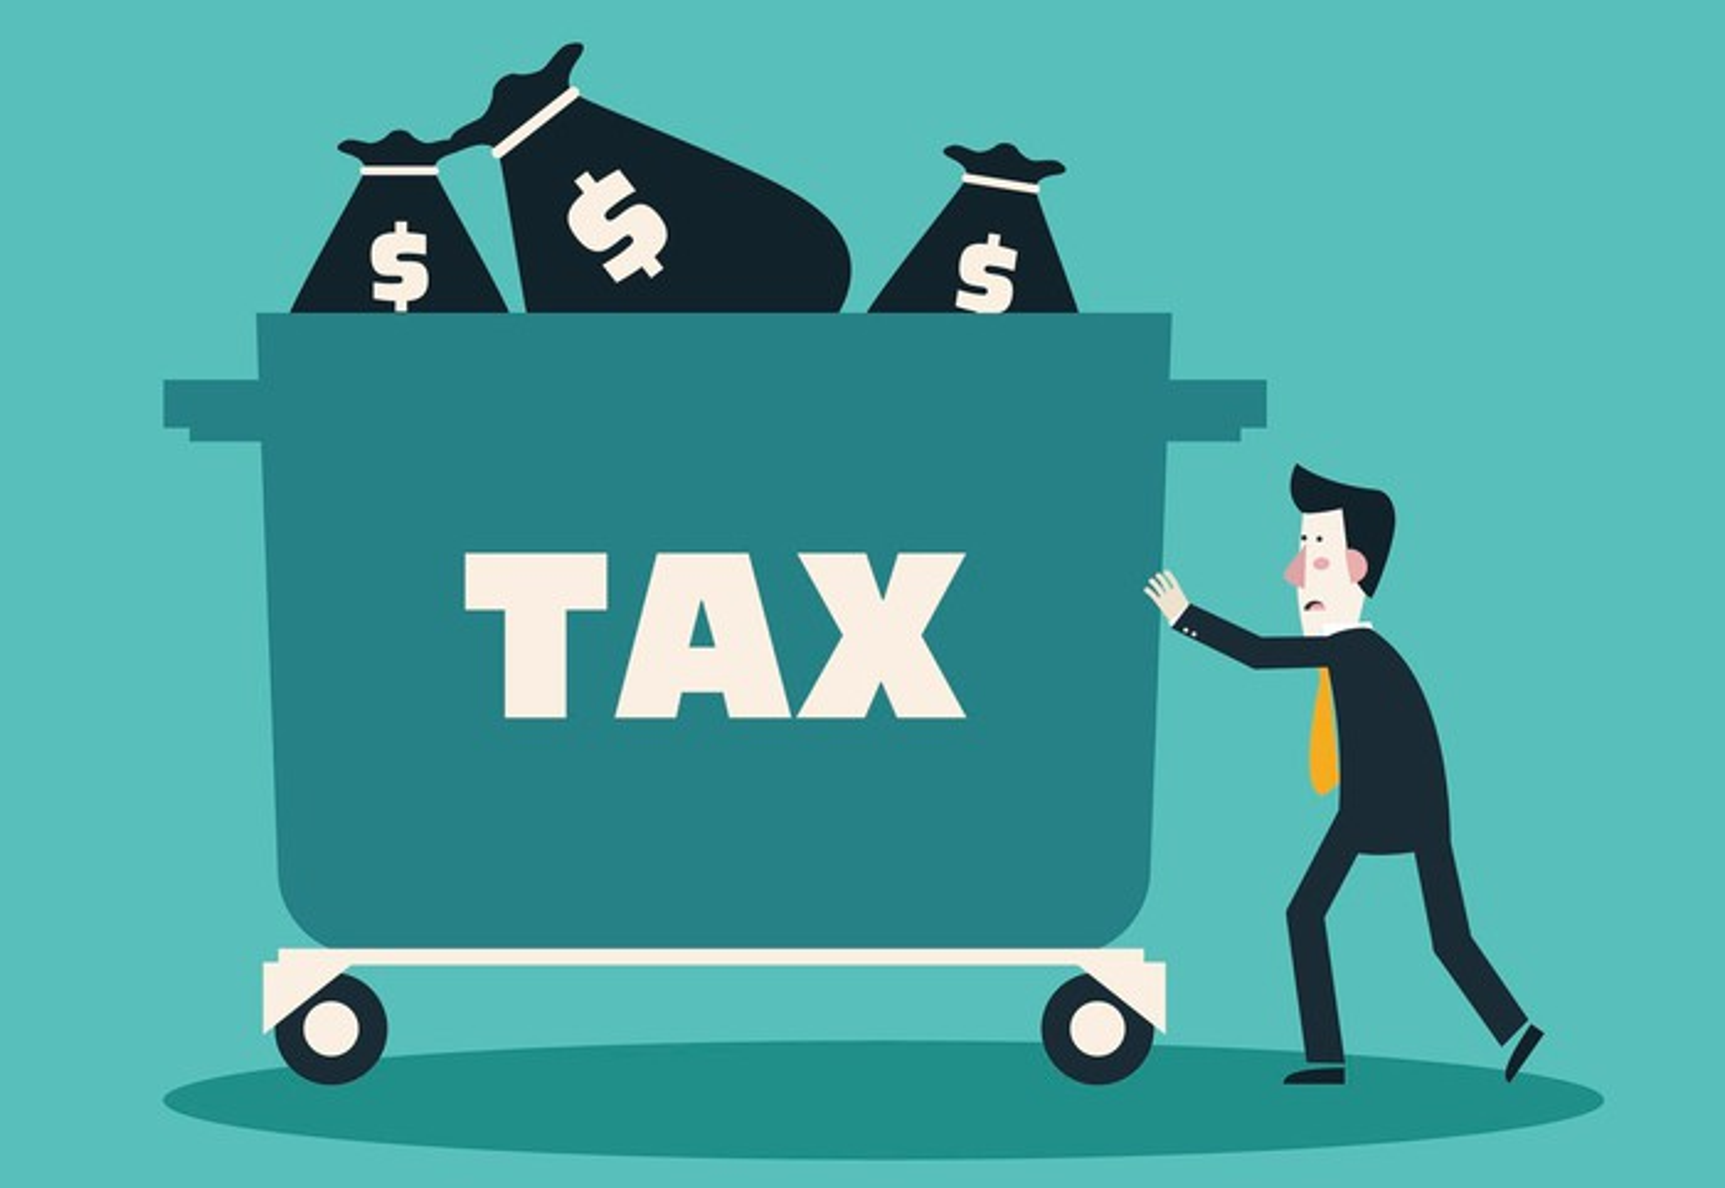 Man pushing cart full of tax dollars